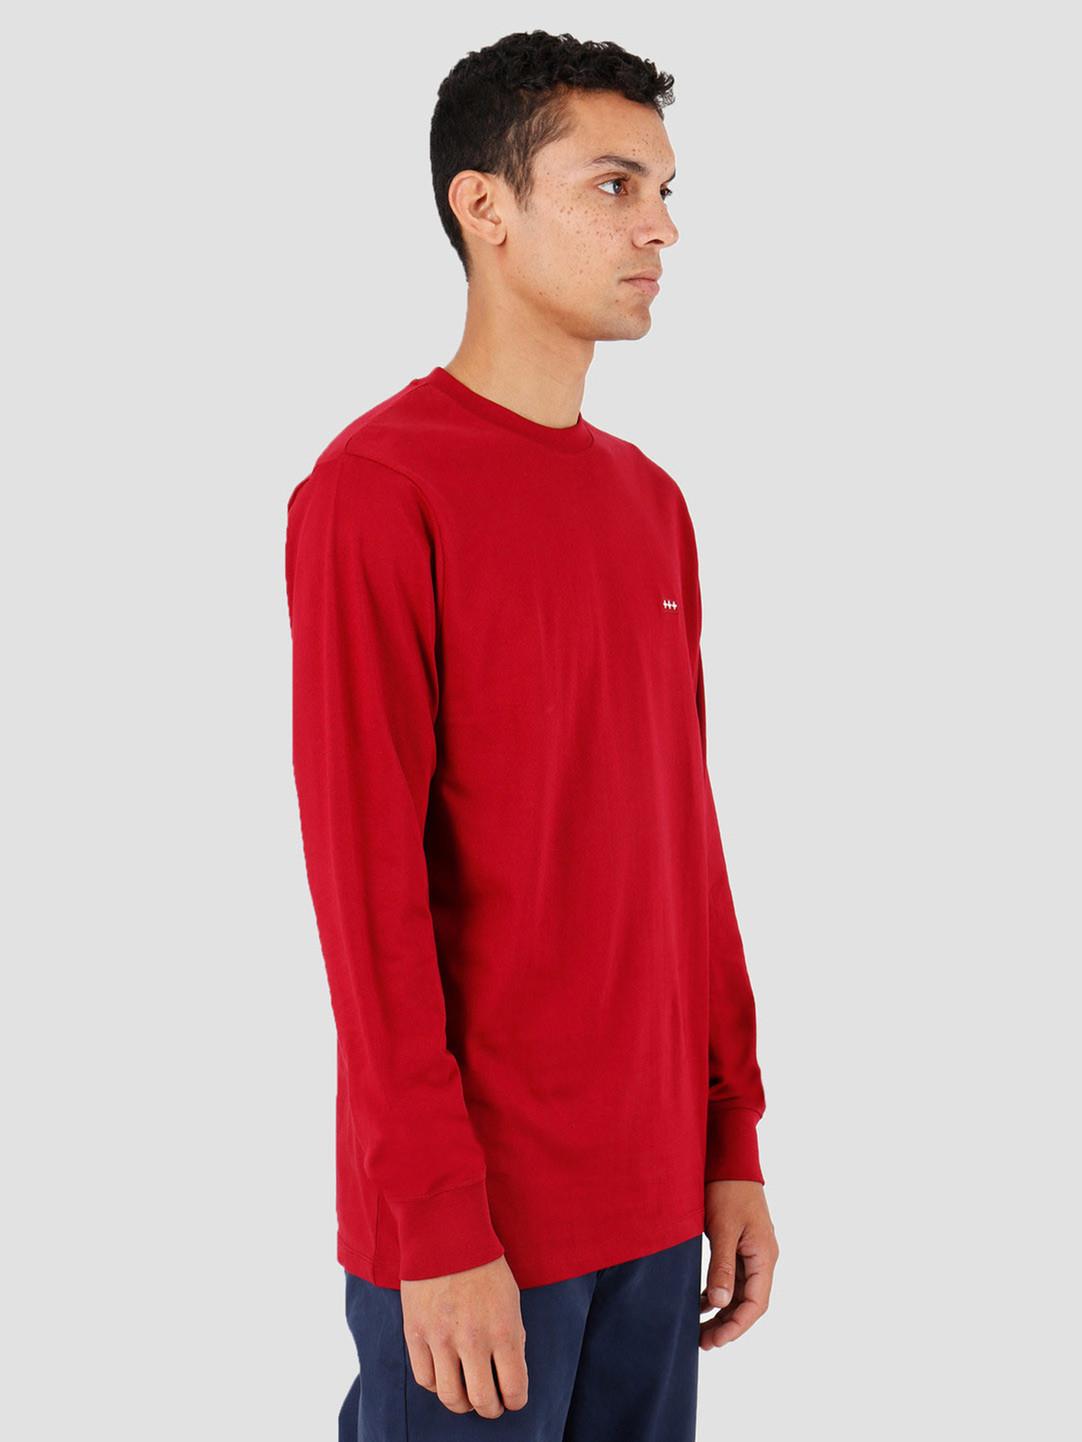 Quality Blanks Quality Blanks QB05 Patch Logo Longsleeve Jewel Red